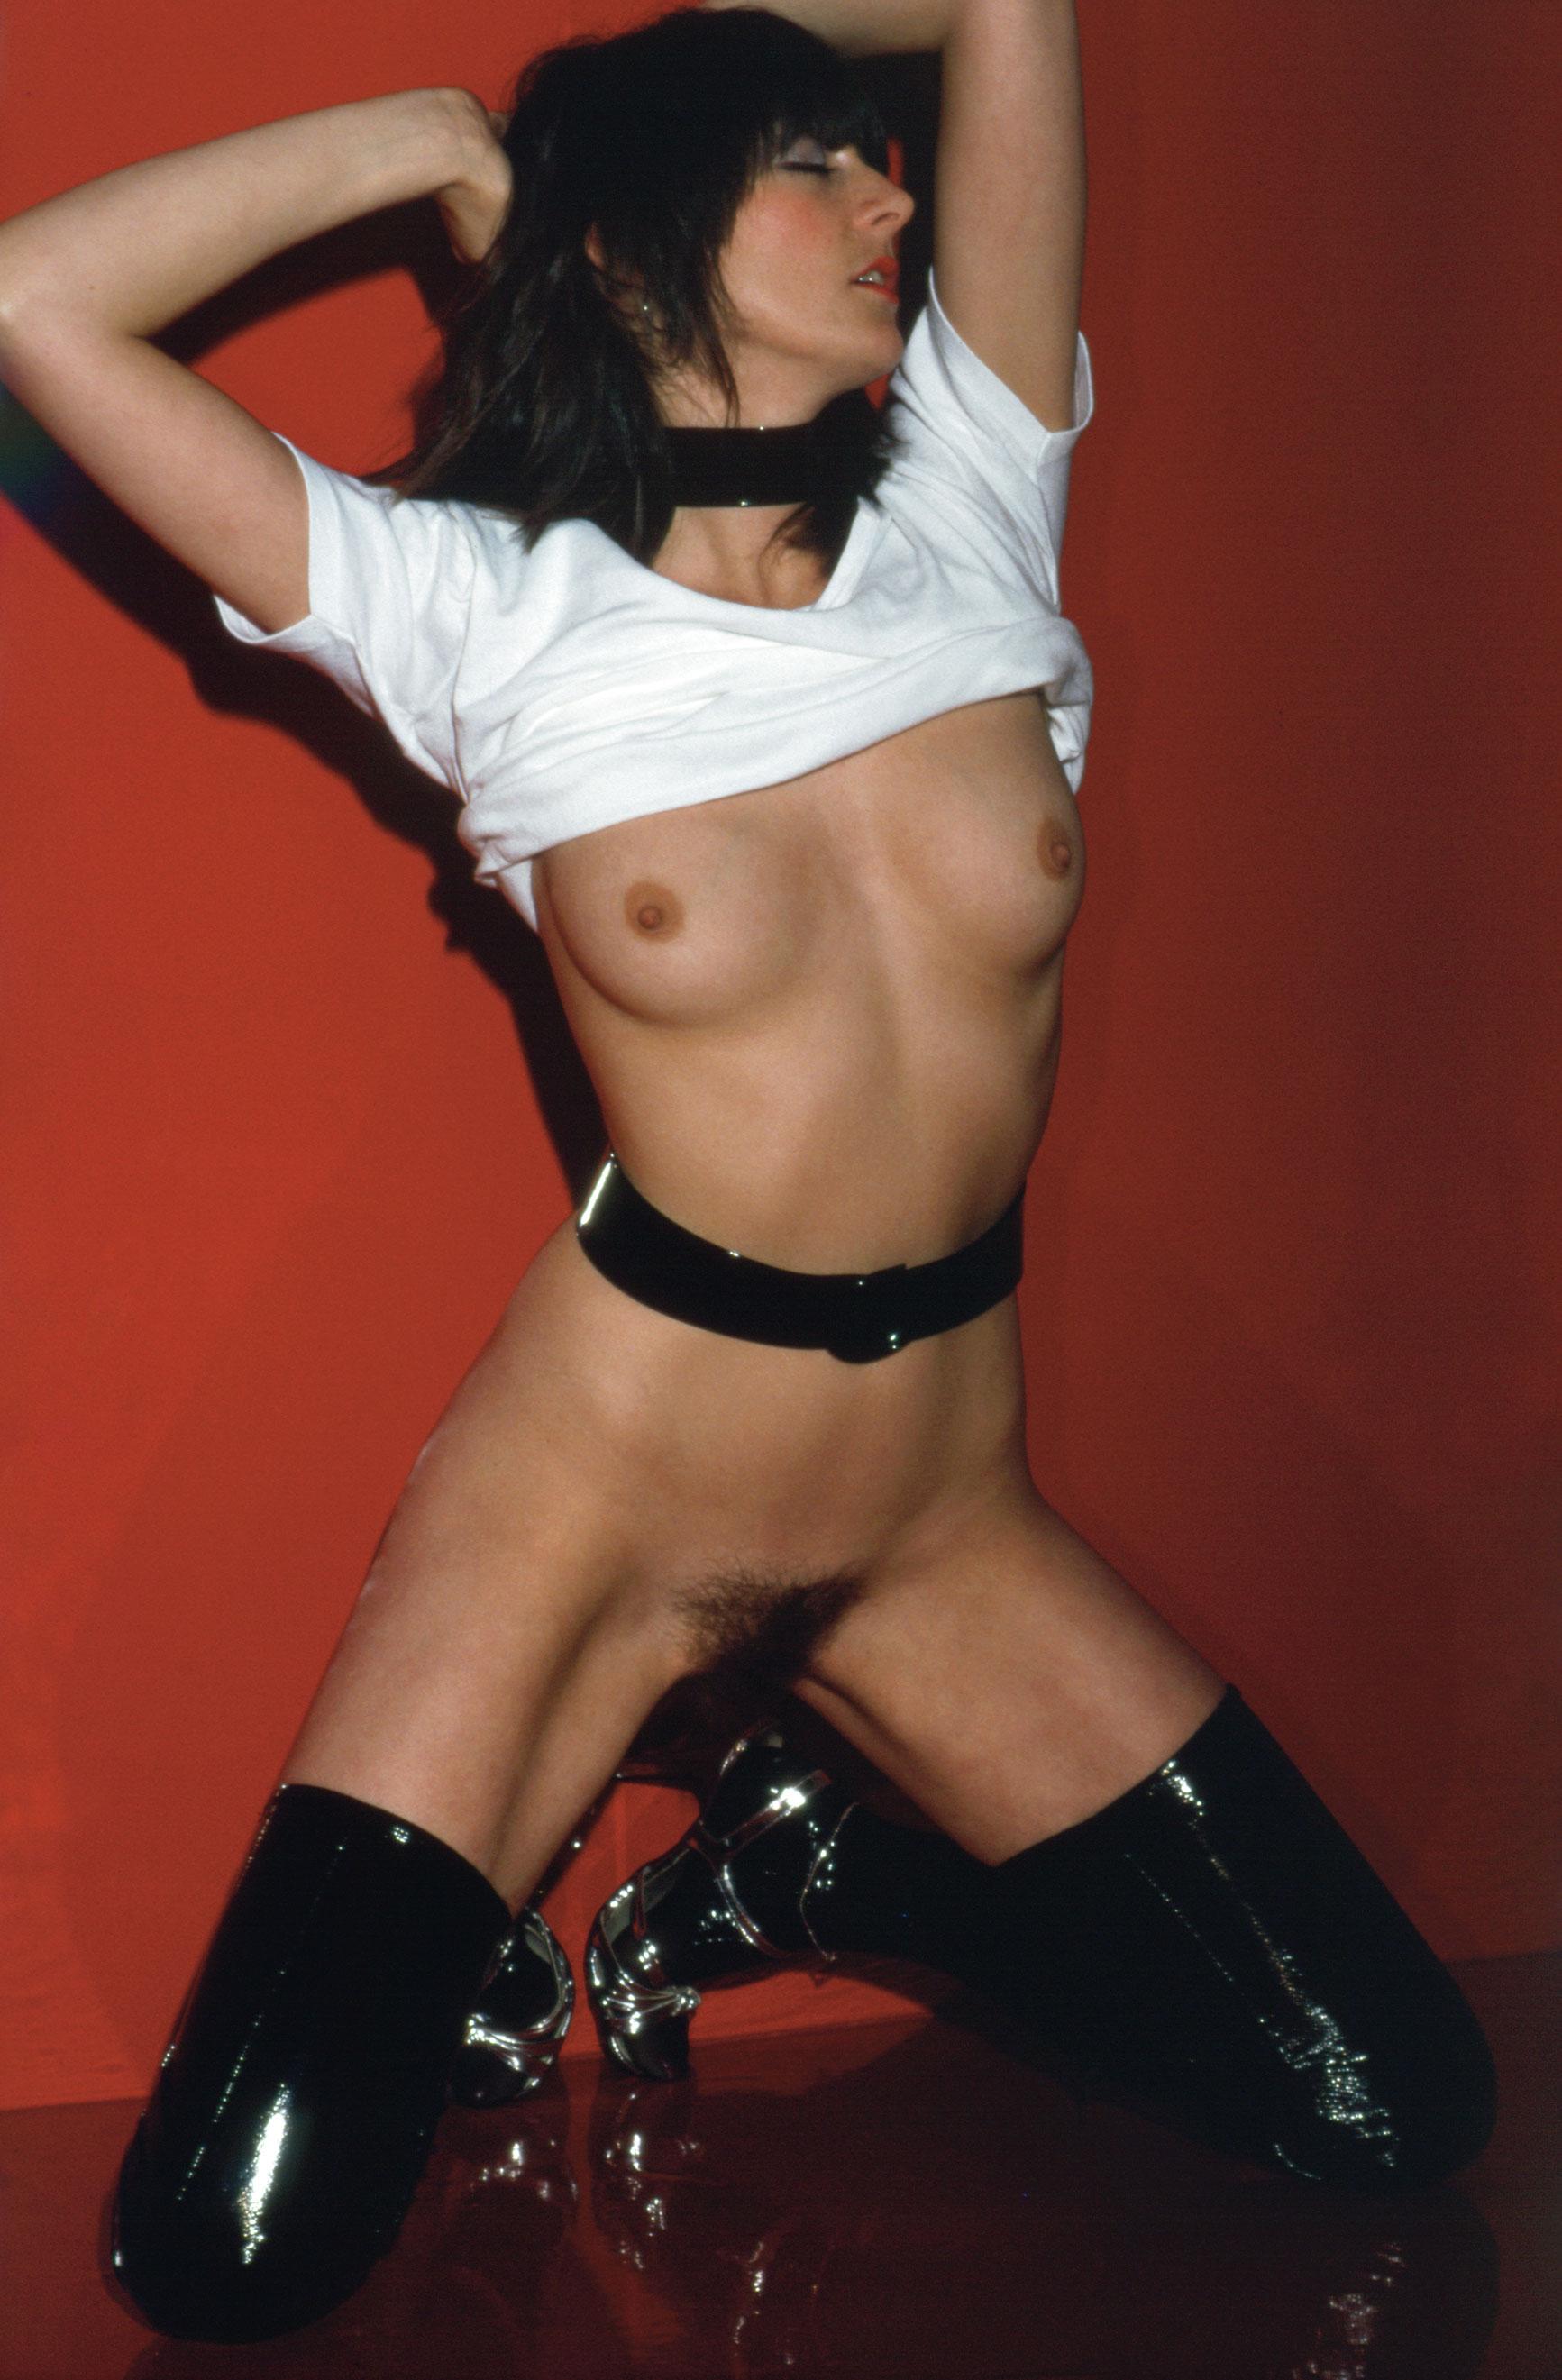 Posing nude, July 1979. © Laszlo Szabo.